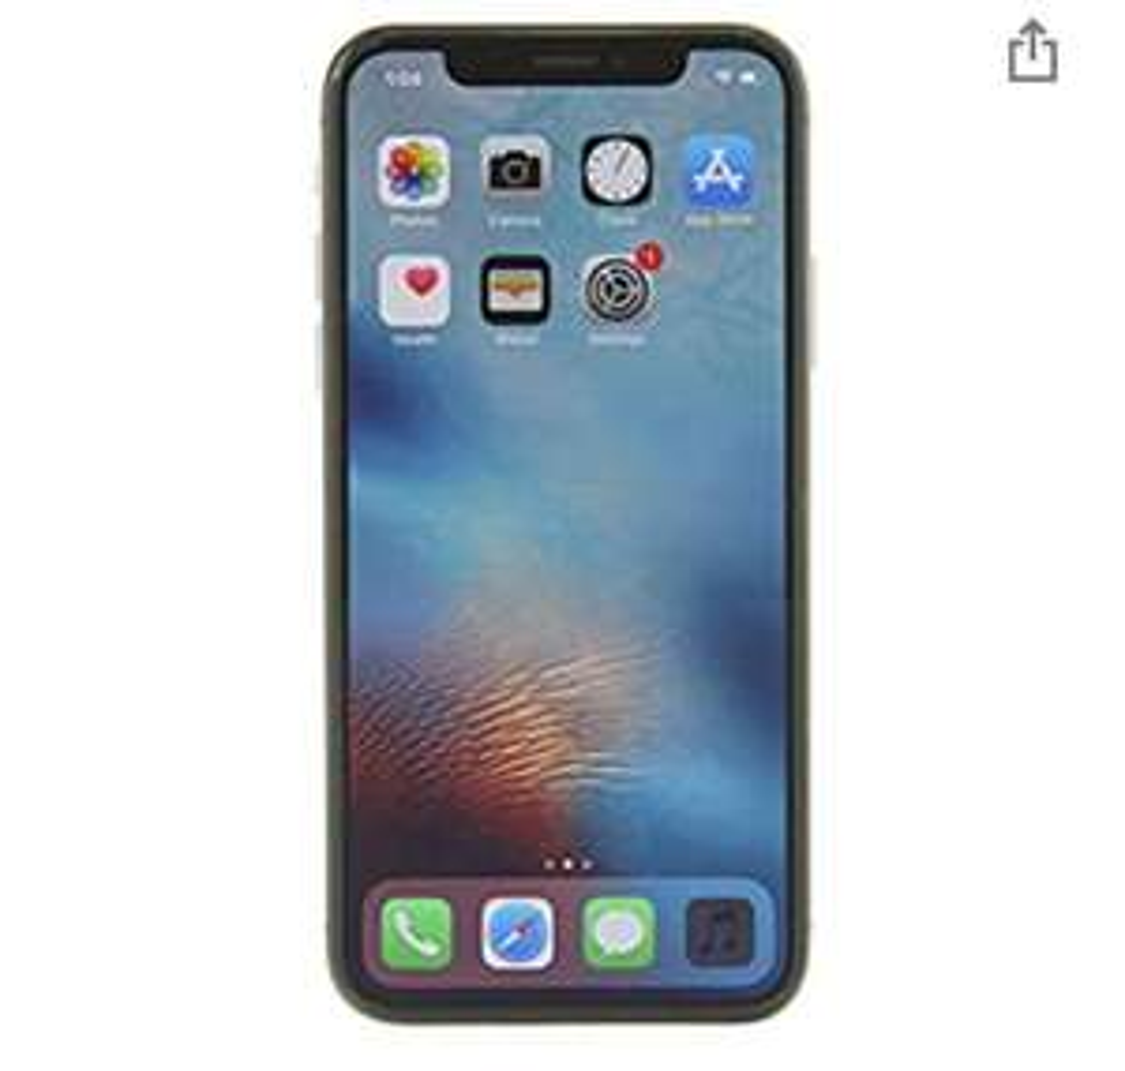 Amazon - Apple iPhone X, 64GB, Space Gray - (Renewed)